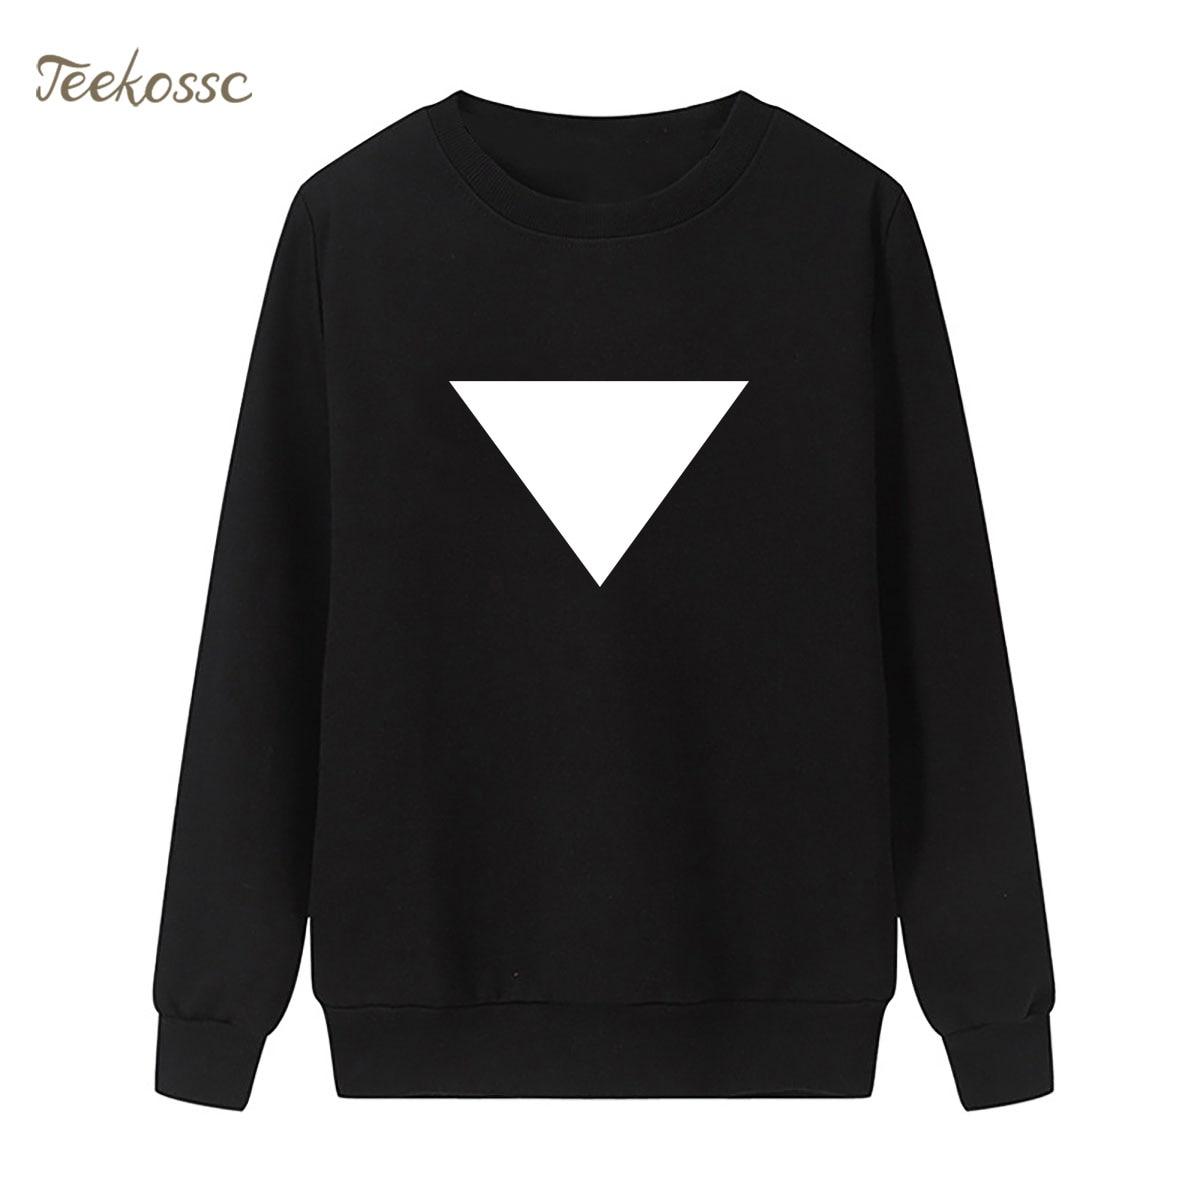 Triangle Print Sweatshirt Black White Hoodie 2018 New Fashion Winter Autumn Women Lasdies Pullover Loose Fit Fleece Sportswear